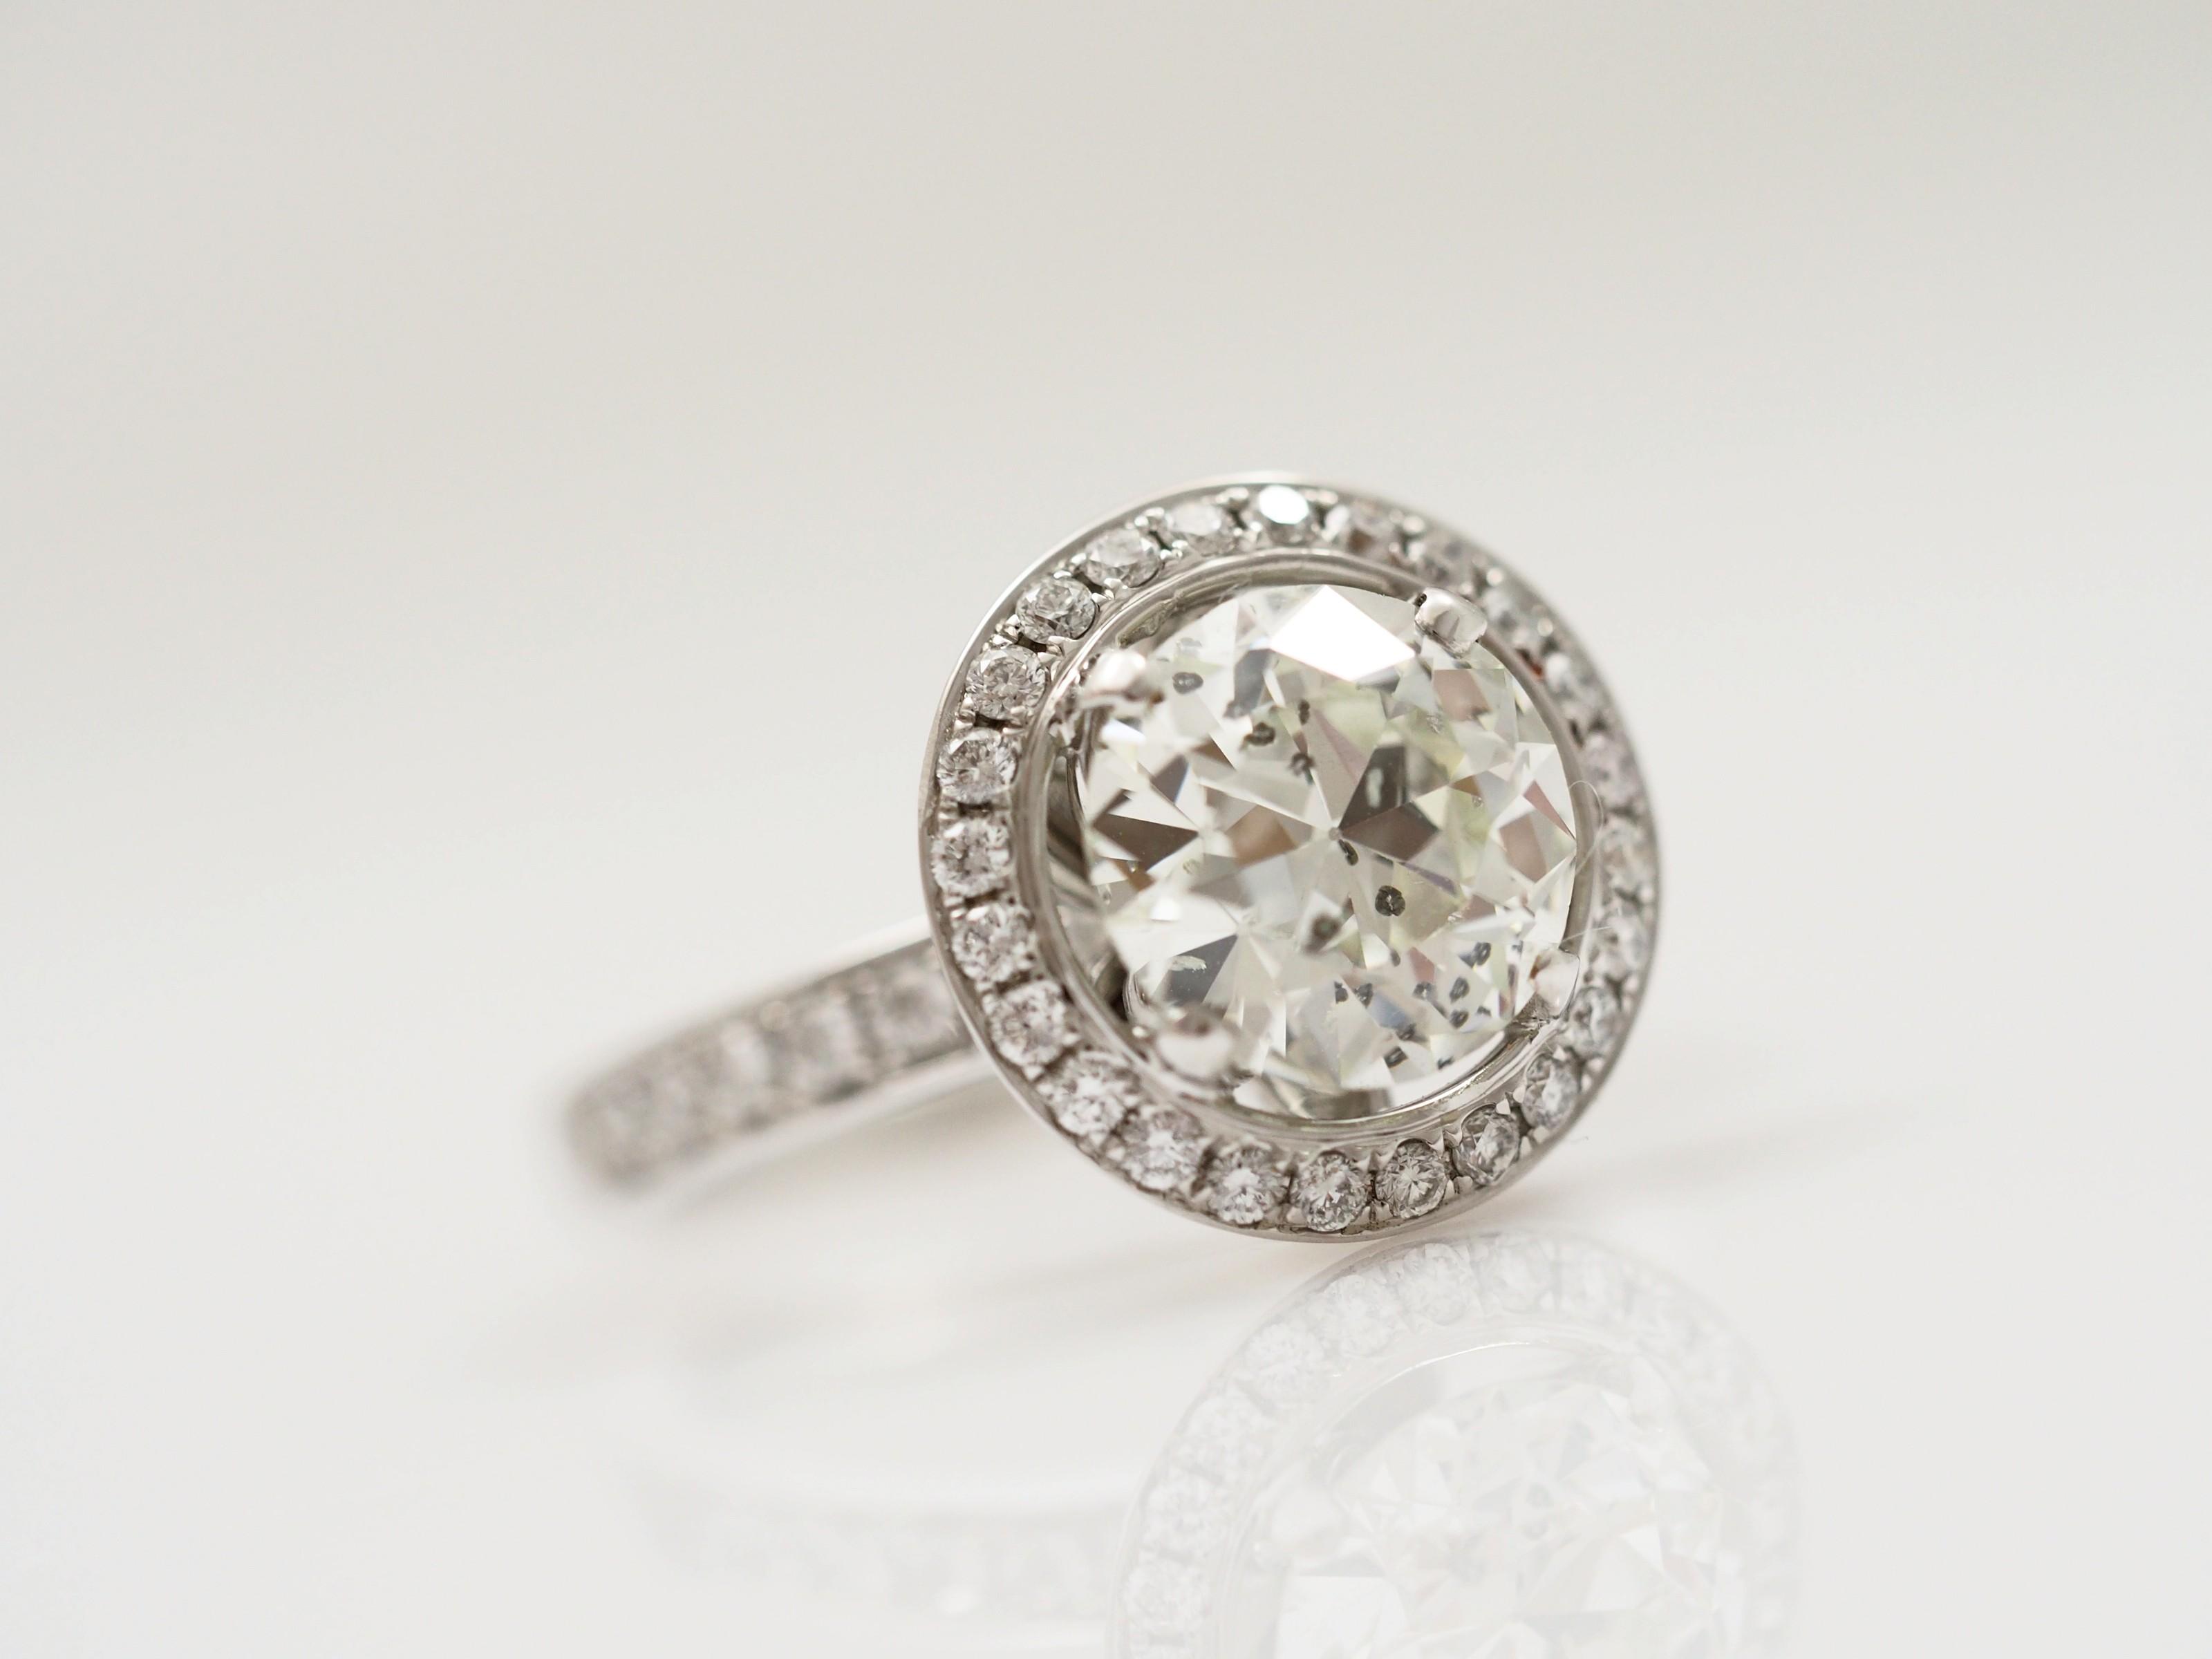 ring mit 3 37 karat solit r brillanten 750 gold wert eur ebay. Black Bedroom Furniture Sets. Home Design Ideas